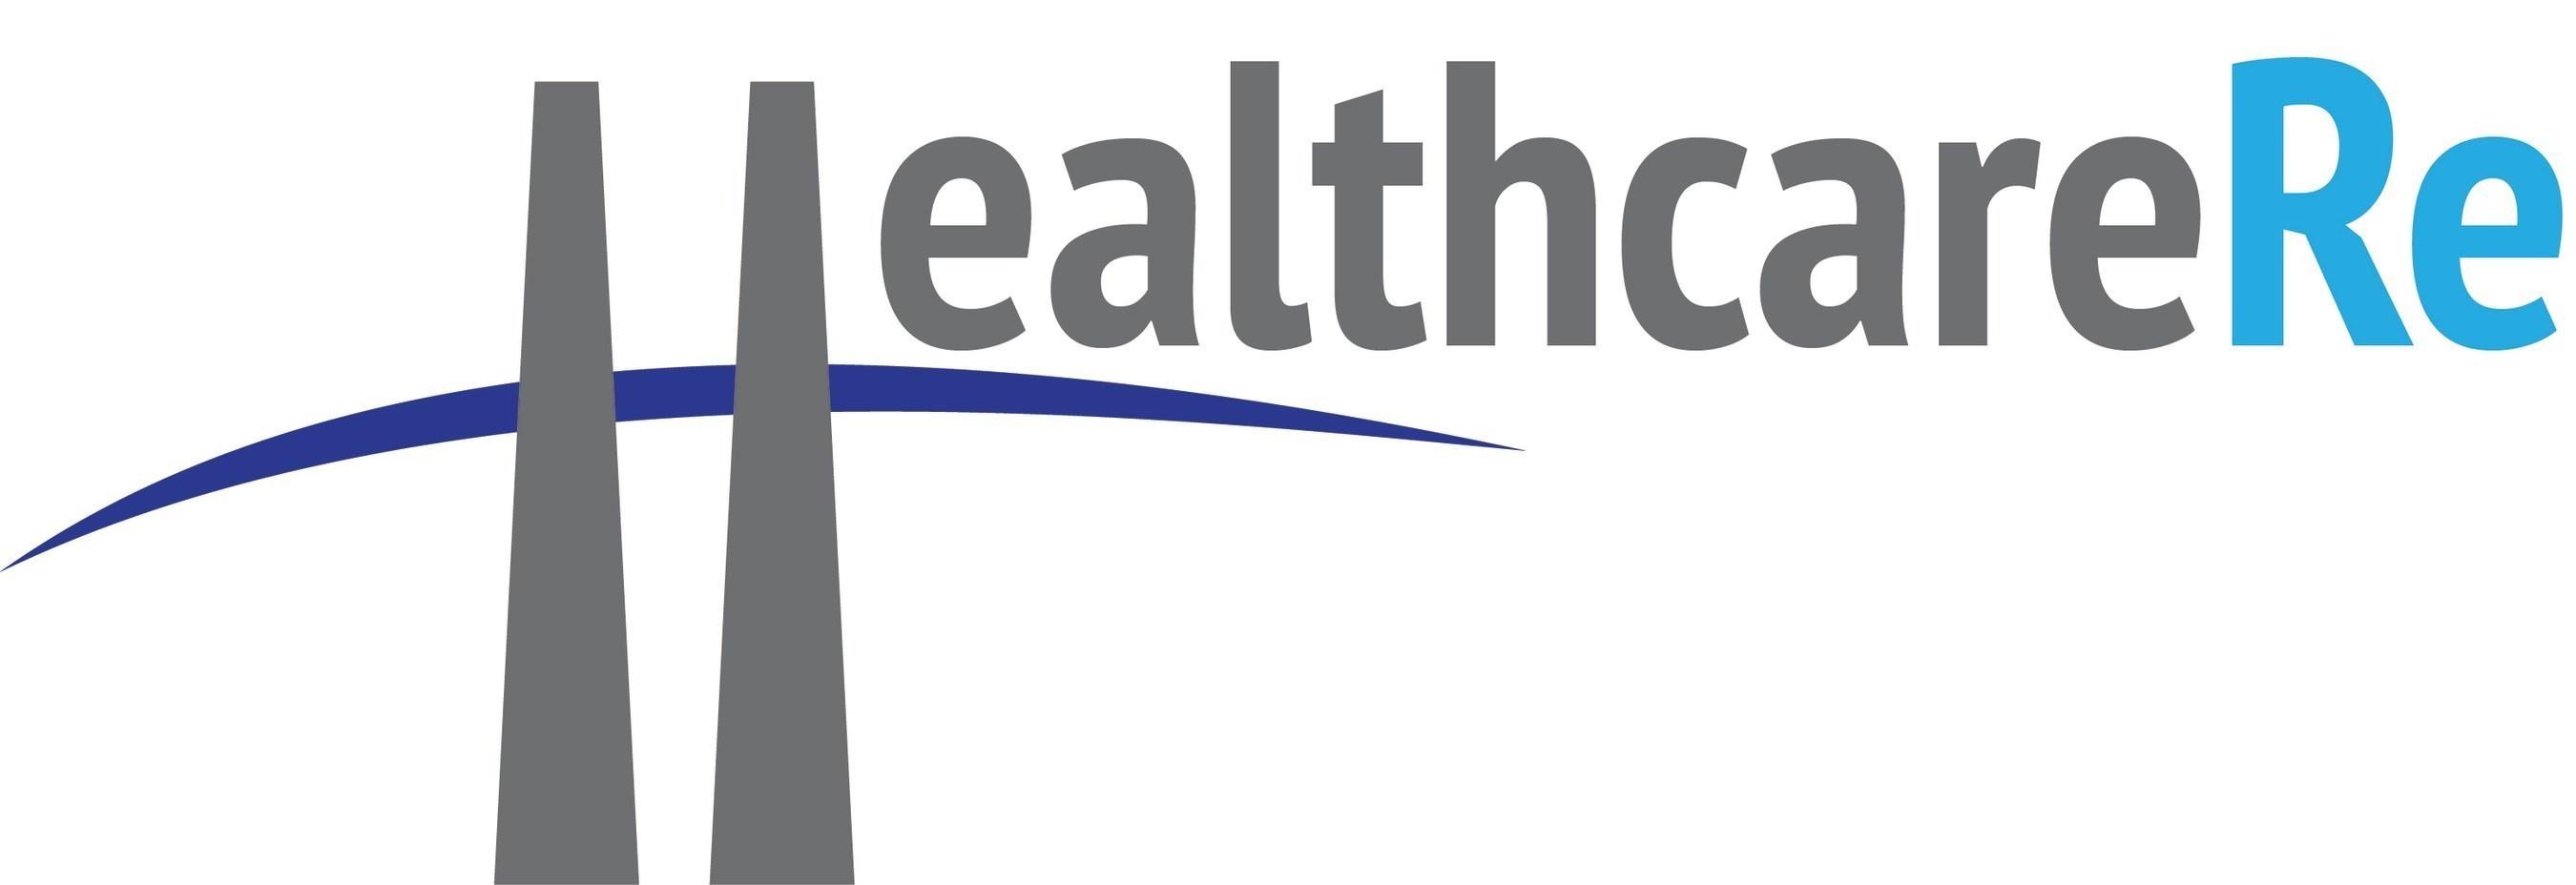 Healthcare Re Logo